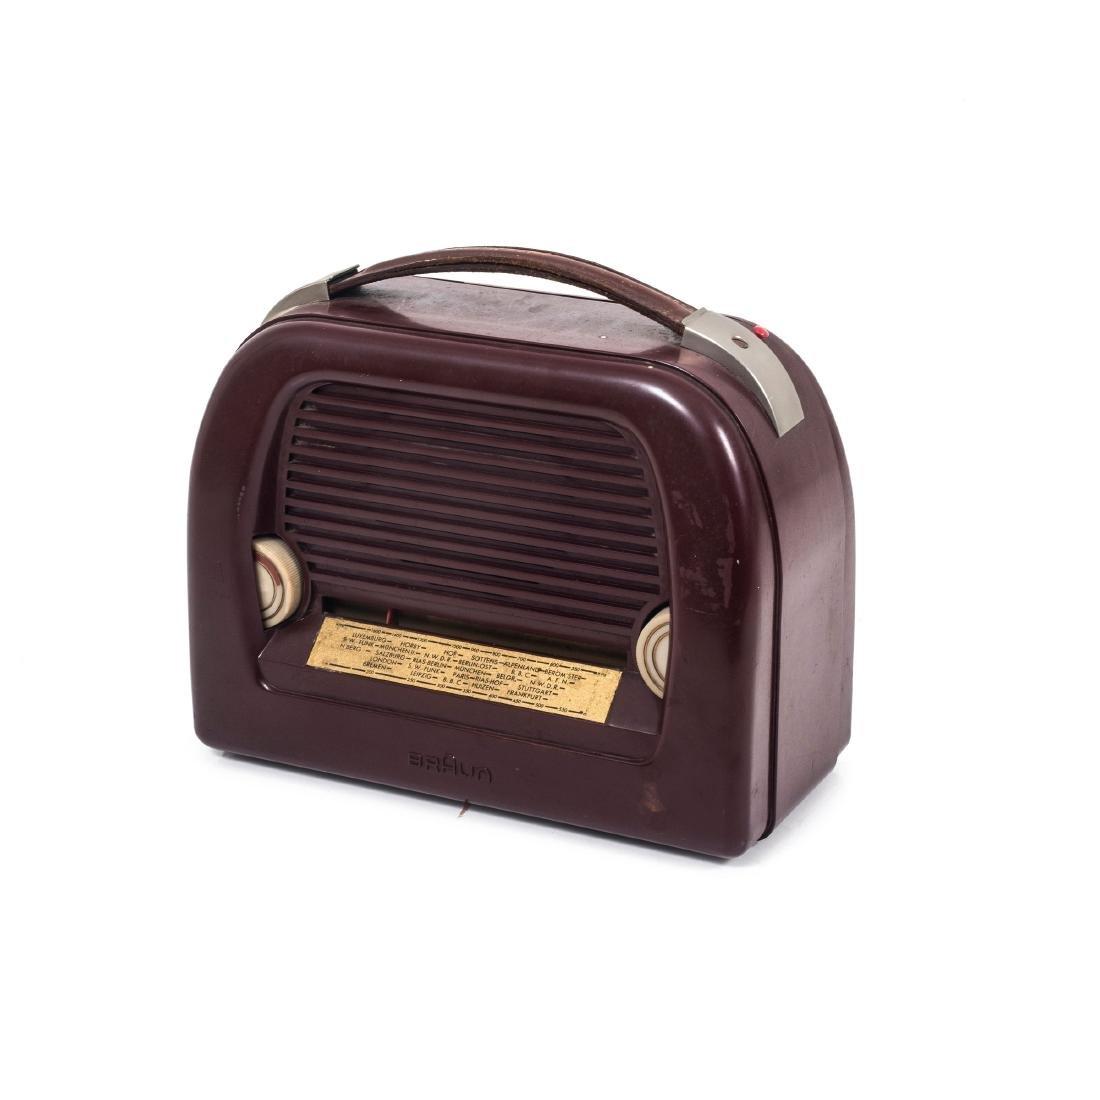 'Pl 51' transistor radio, 1951